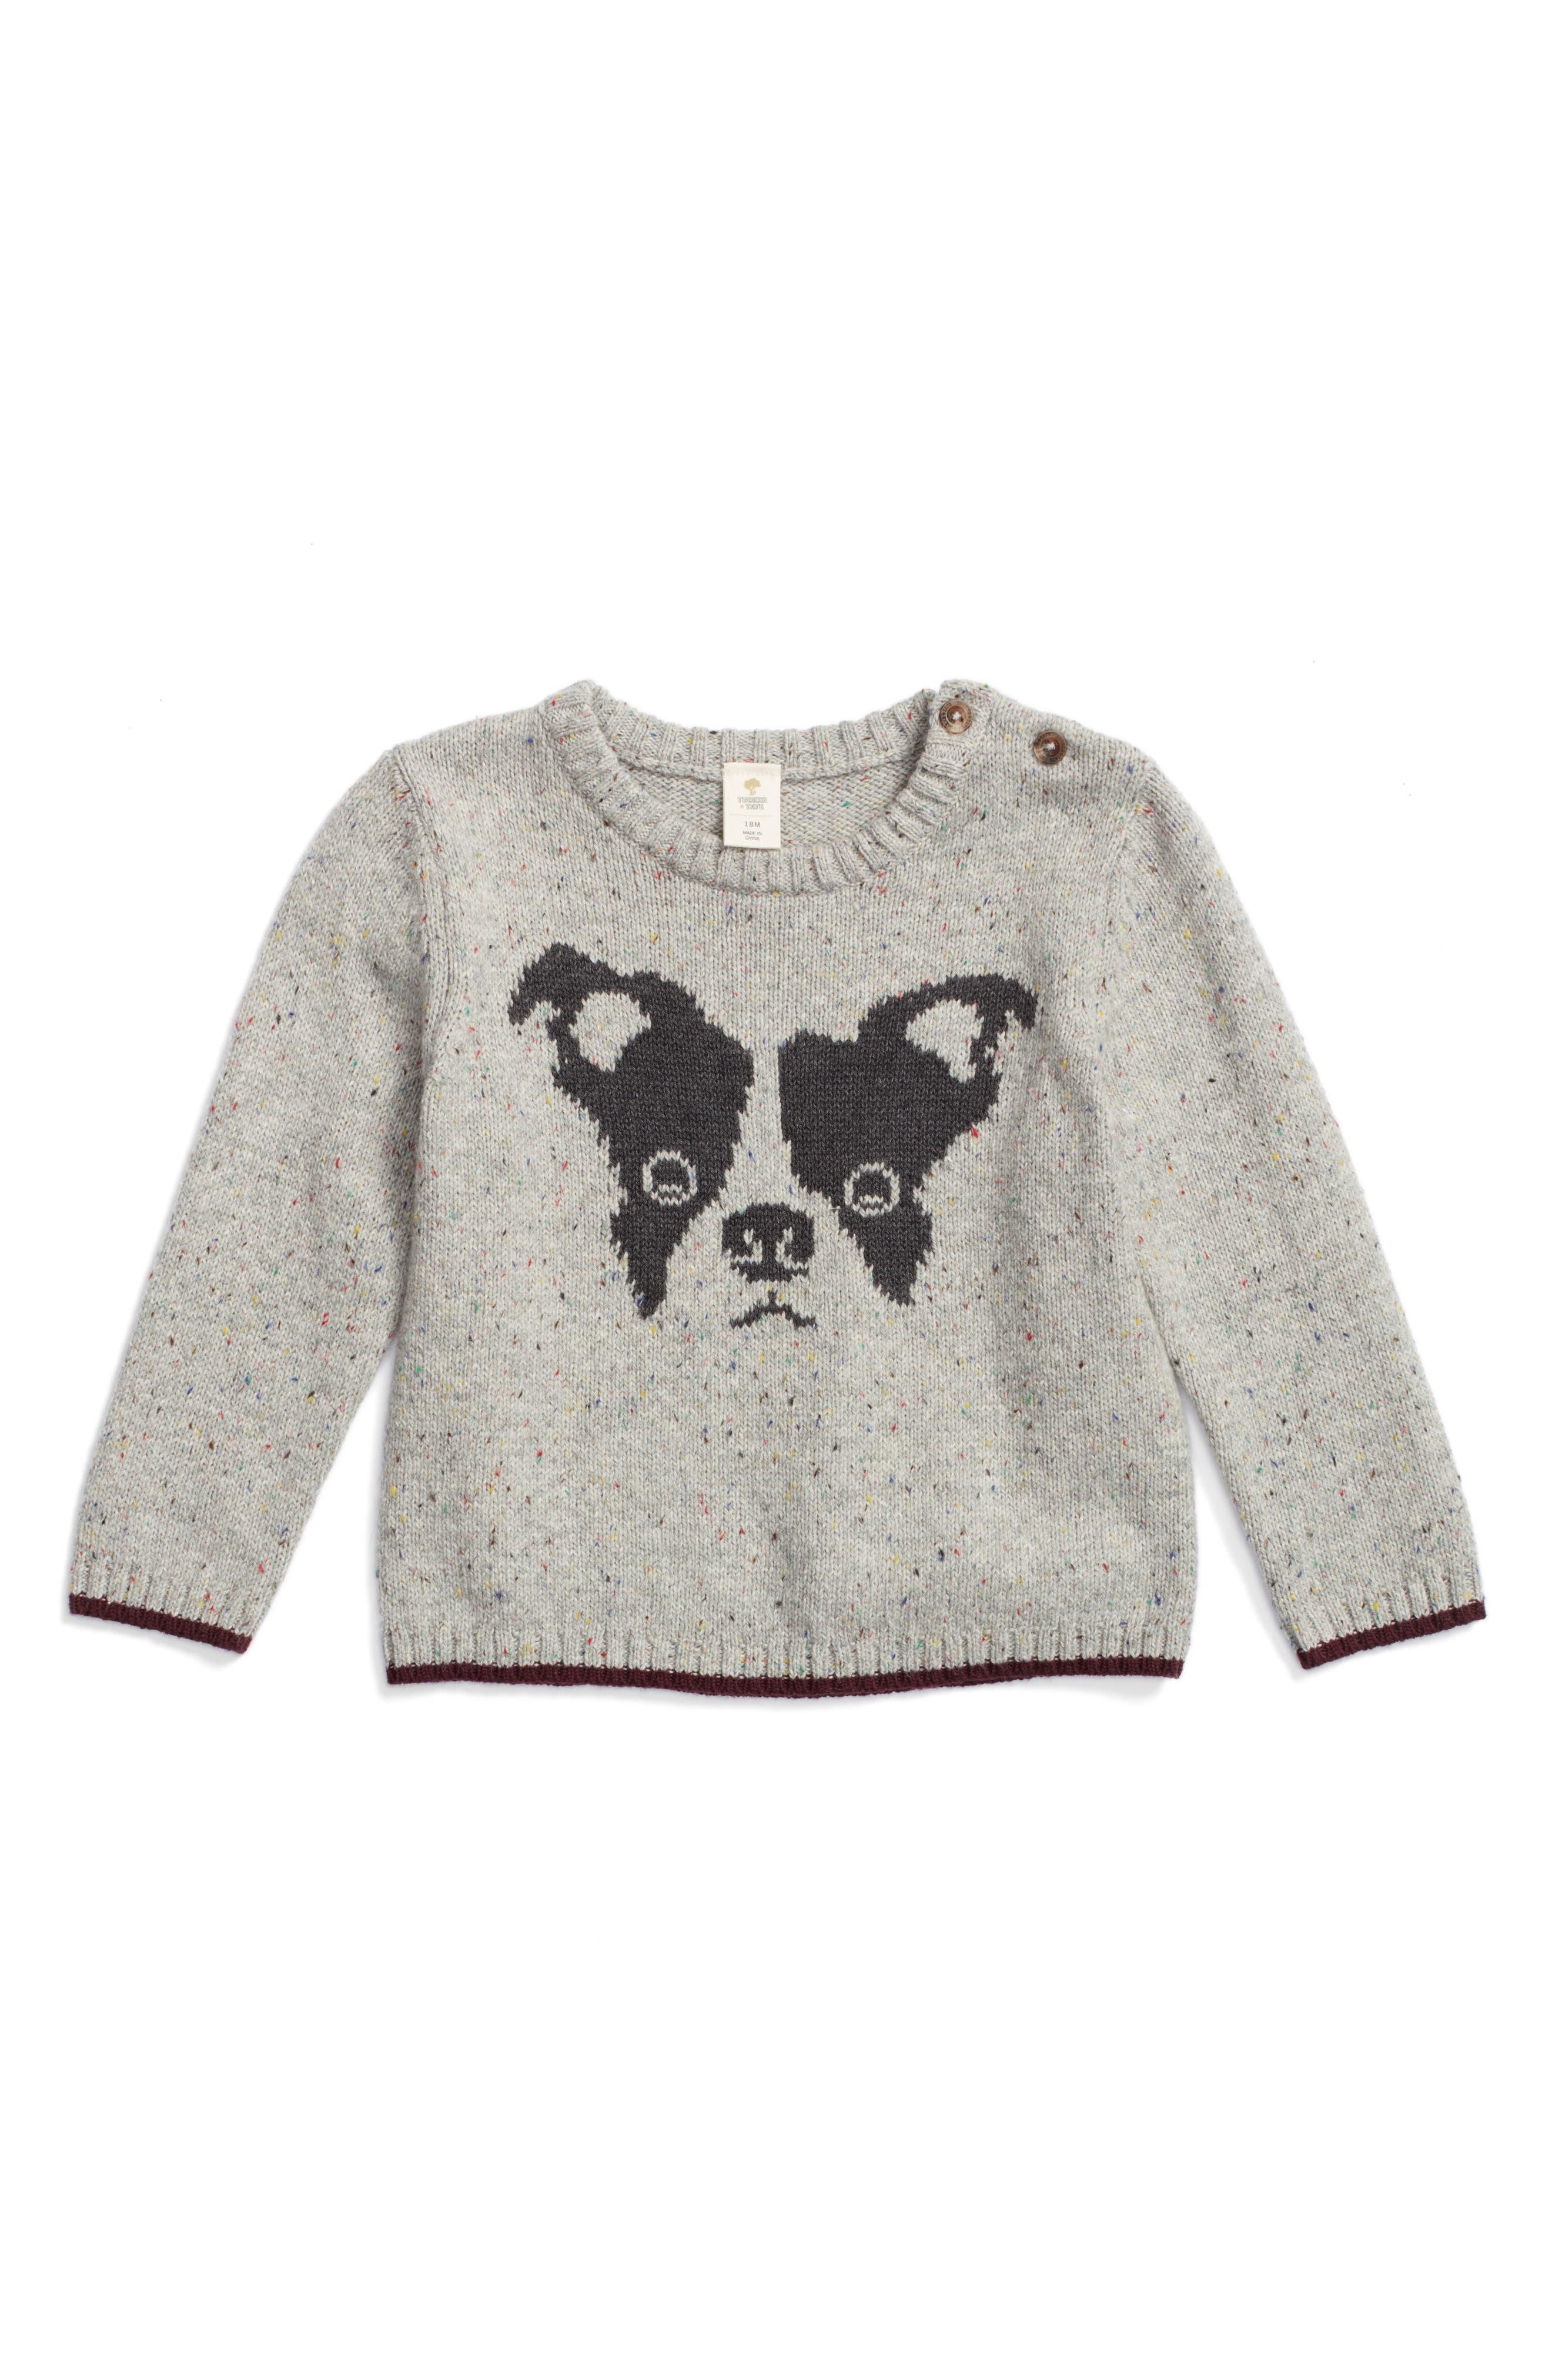 Intarsia Knit Dog Sweater,                             Main thumbnail 1, color,                             Grey Ash Heather Dog